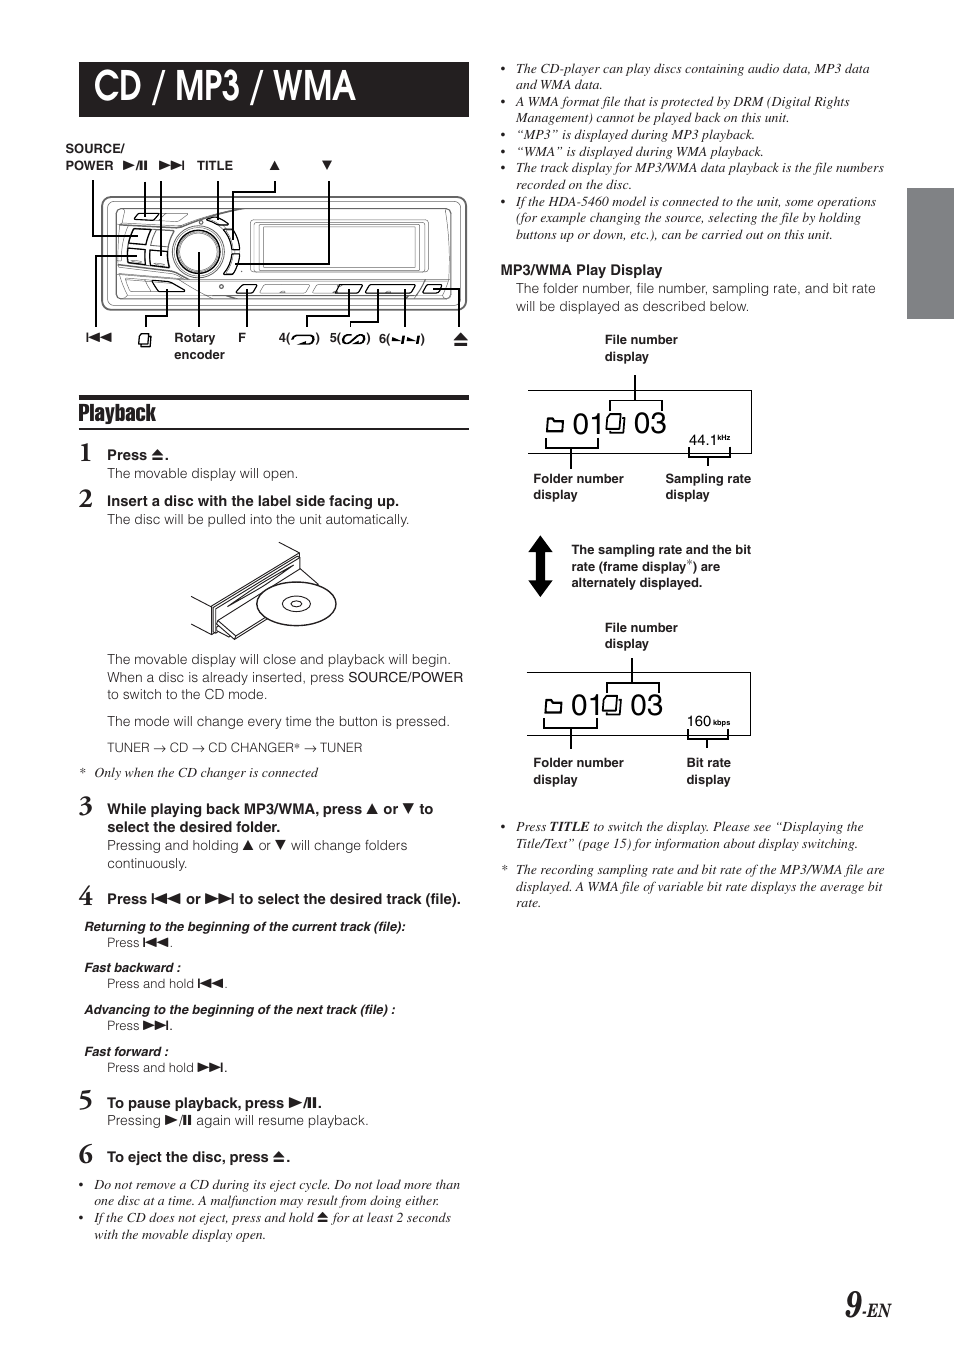 cd mp3 wma playback alpine cda 9851 user manual page 10 rh manualsdir com Alpine CDA 9851 iPod Cable Alpine CDA 9851 Owner's Manual